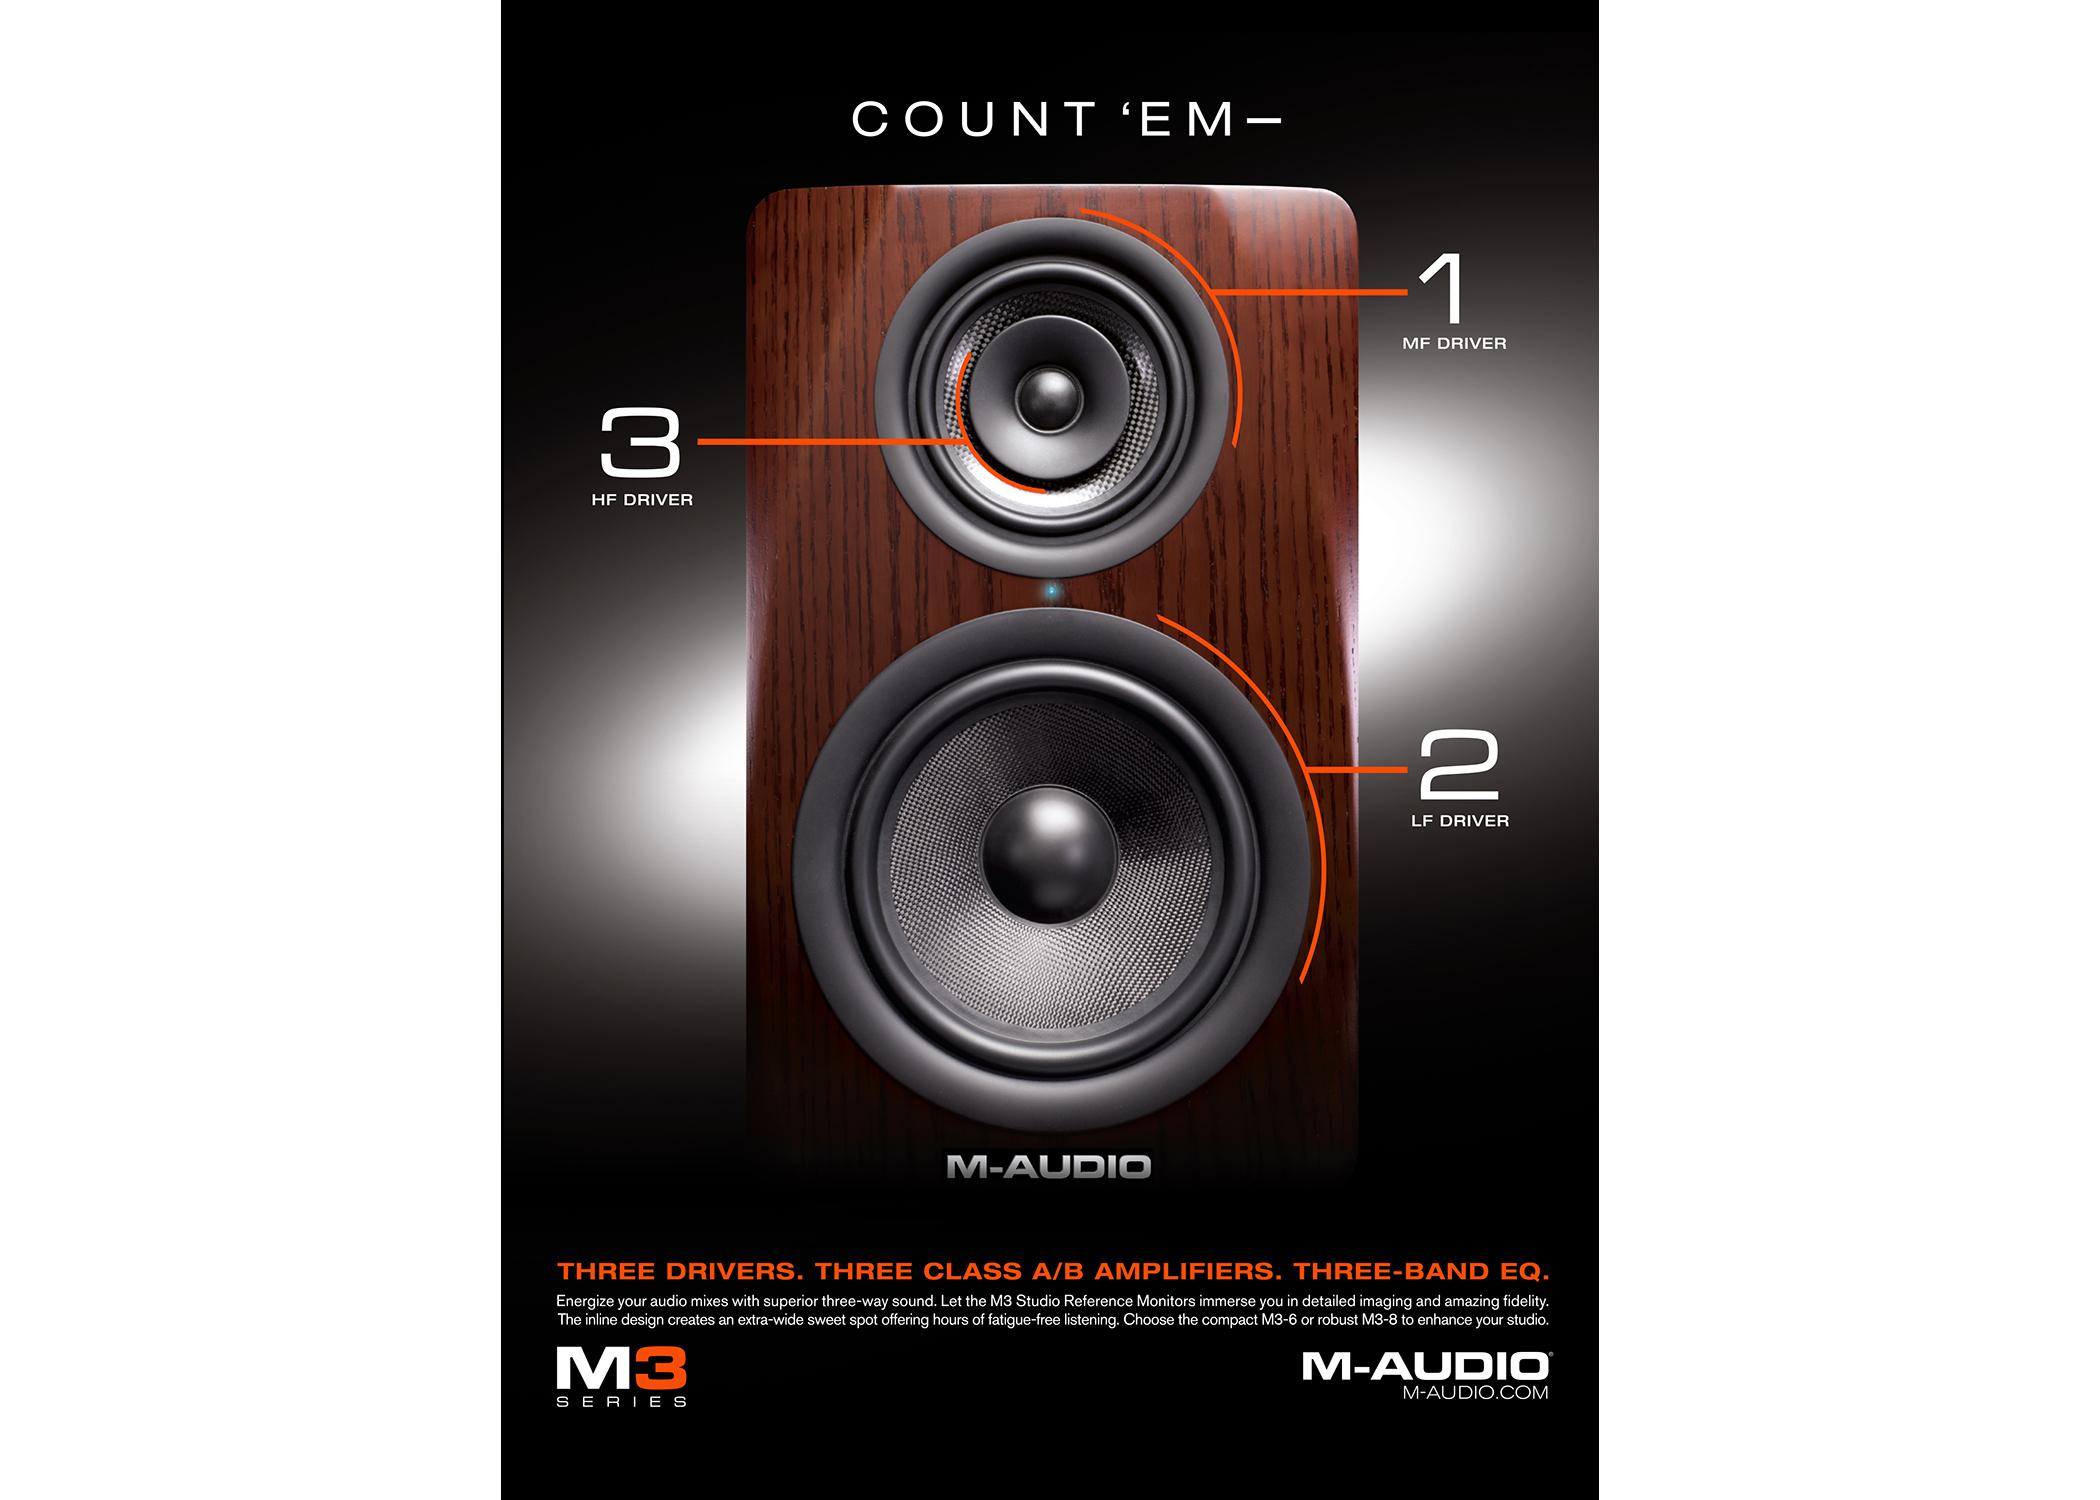 MAUDIO_M3Series_MF_OUT.jpg